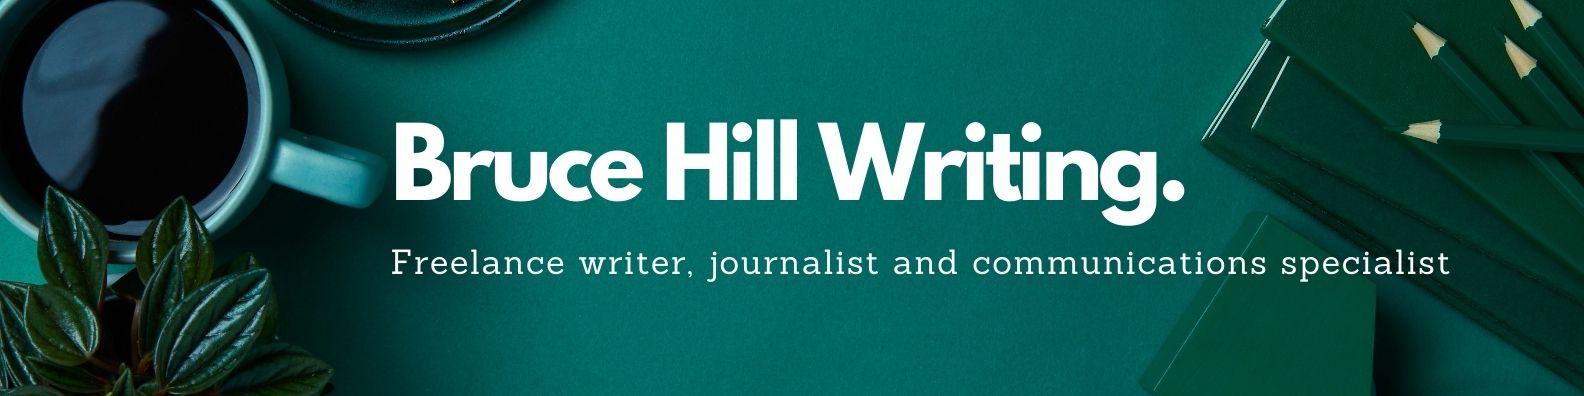 Bruce Hill Writing